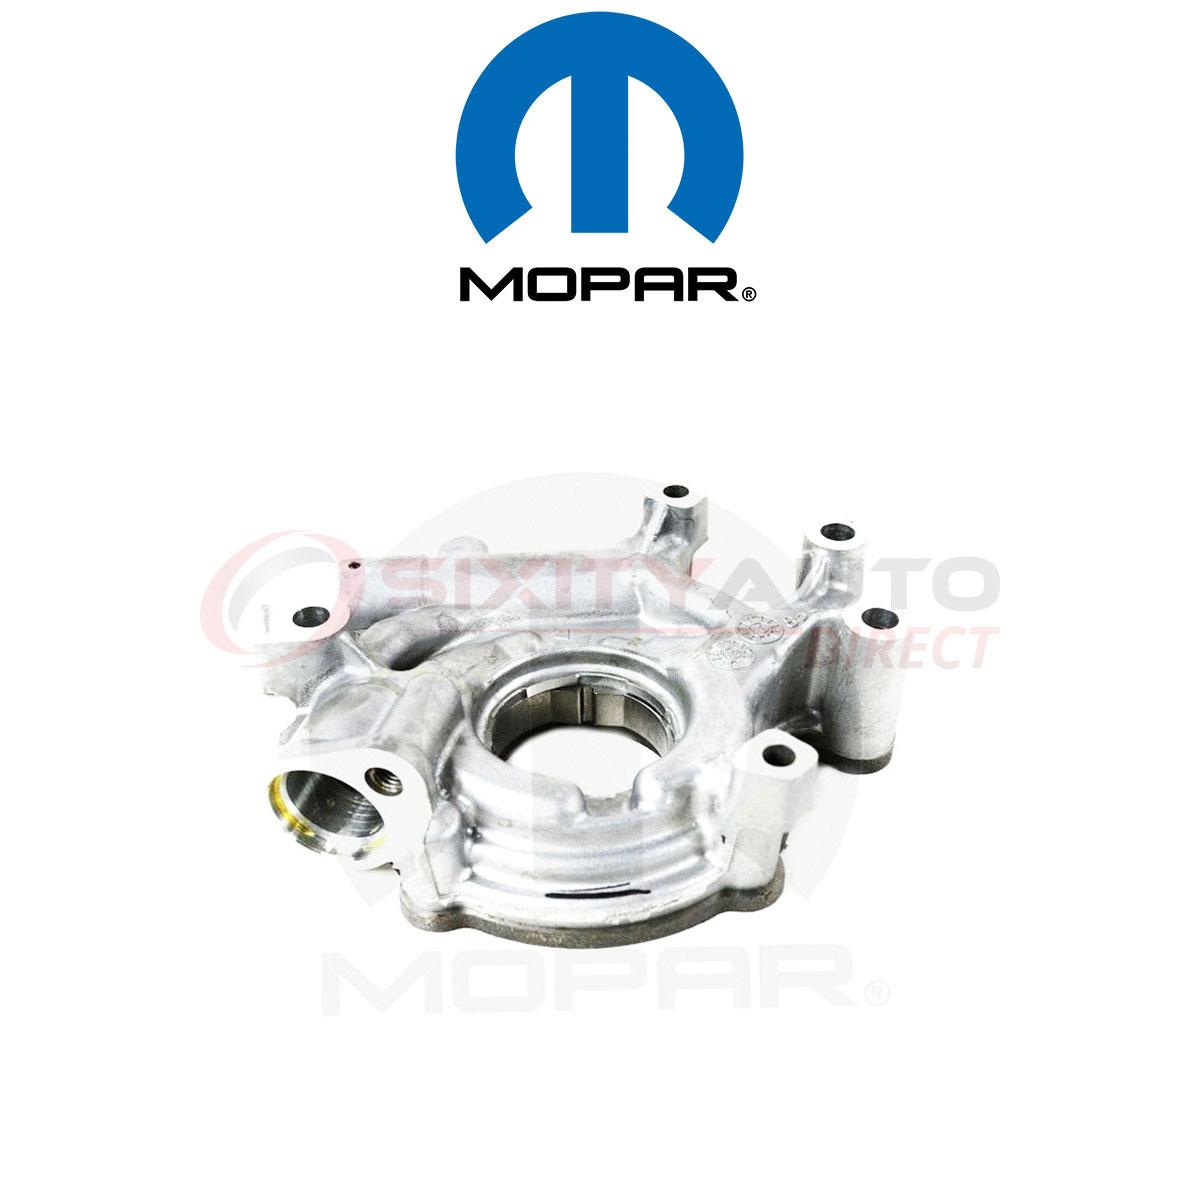 Mopar Engine Oil Pump for 2002-2010 Dodge Ram 1500 3.7L 4